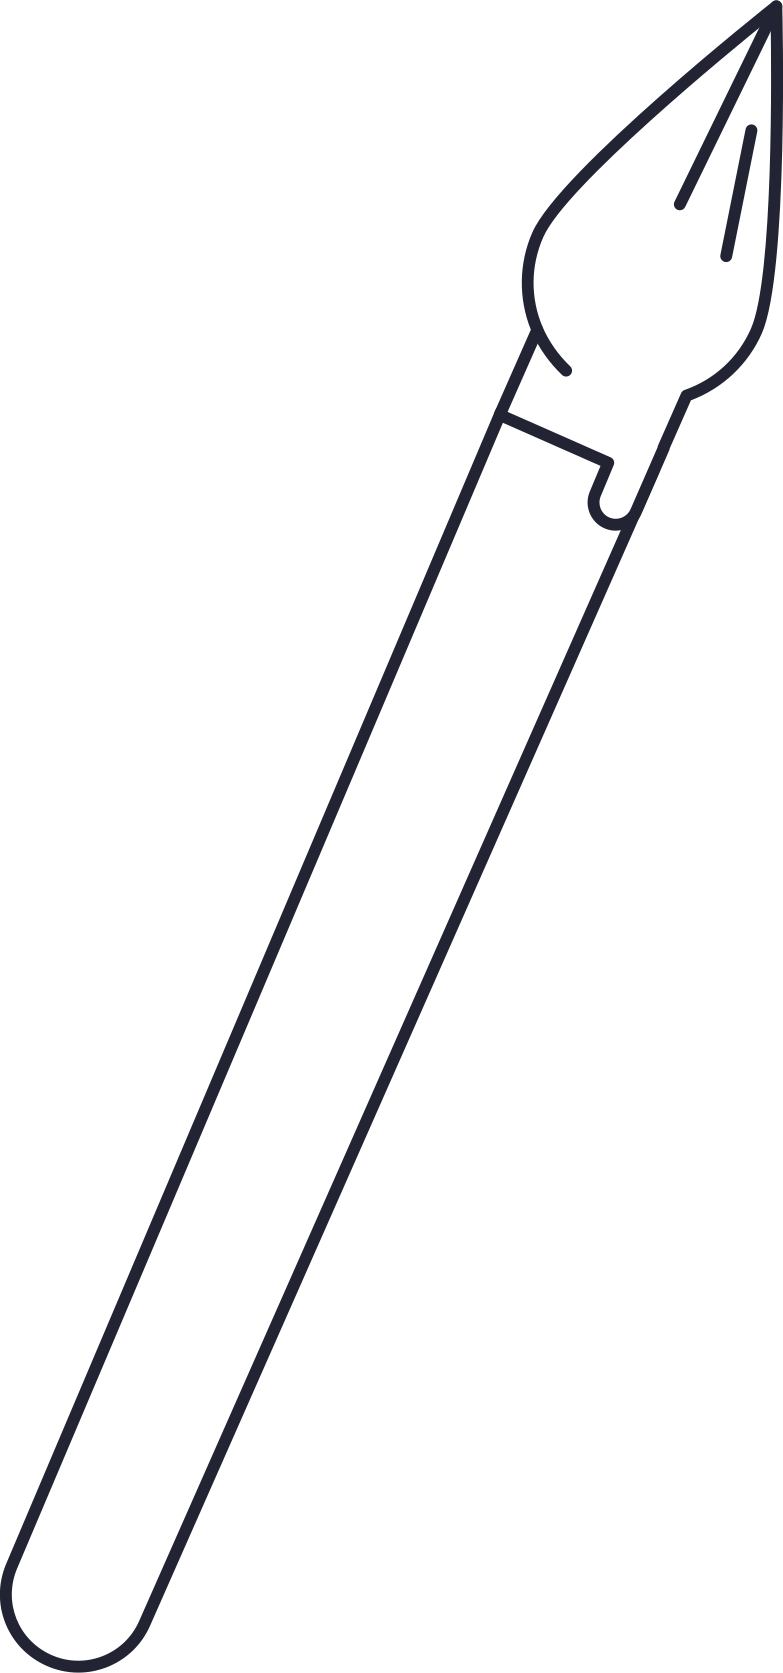 education  brush Clipart illustration in PNG, SVG